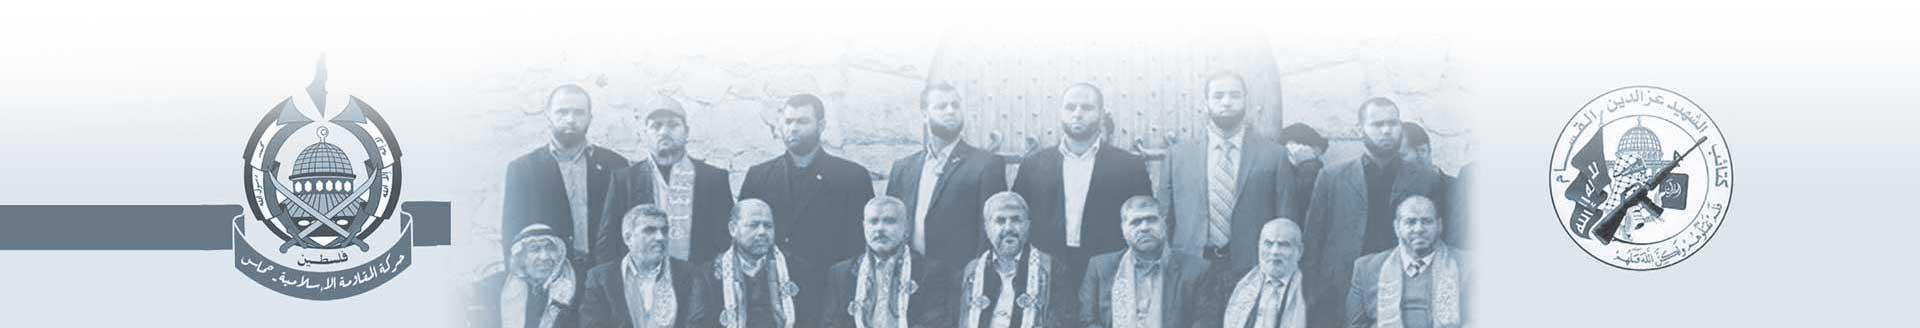 Linde v. Arab Bank, Plc - Payments to Hamas Leaders - Osen LLC